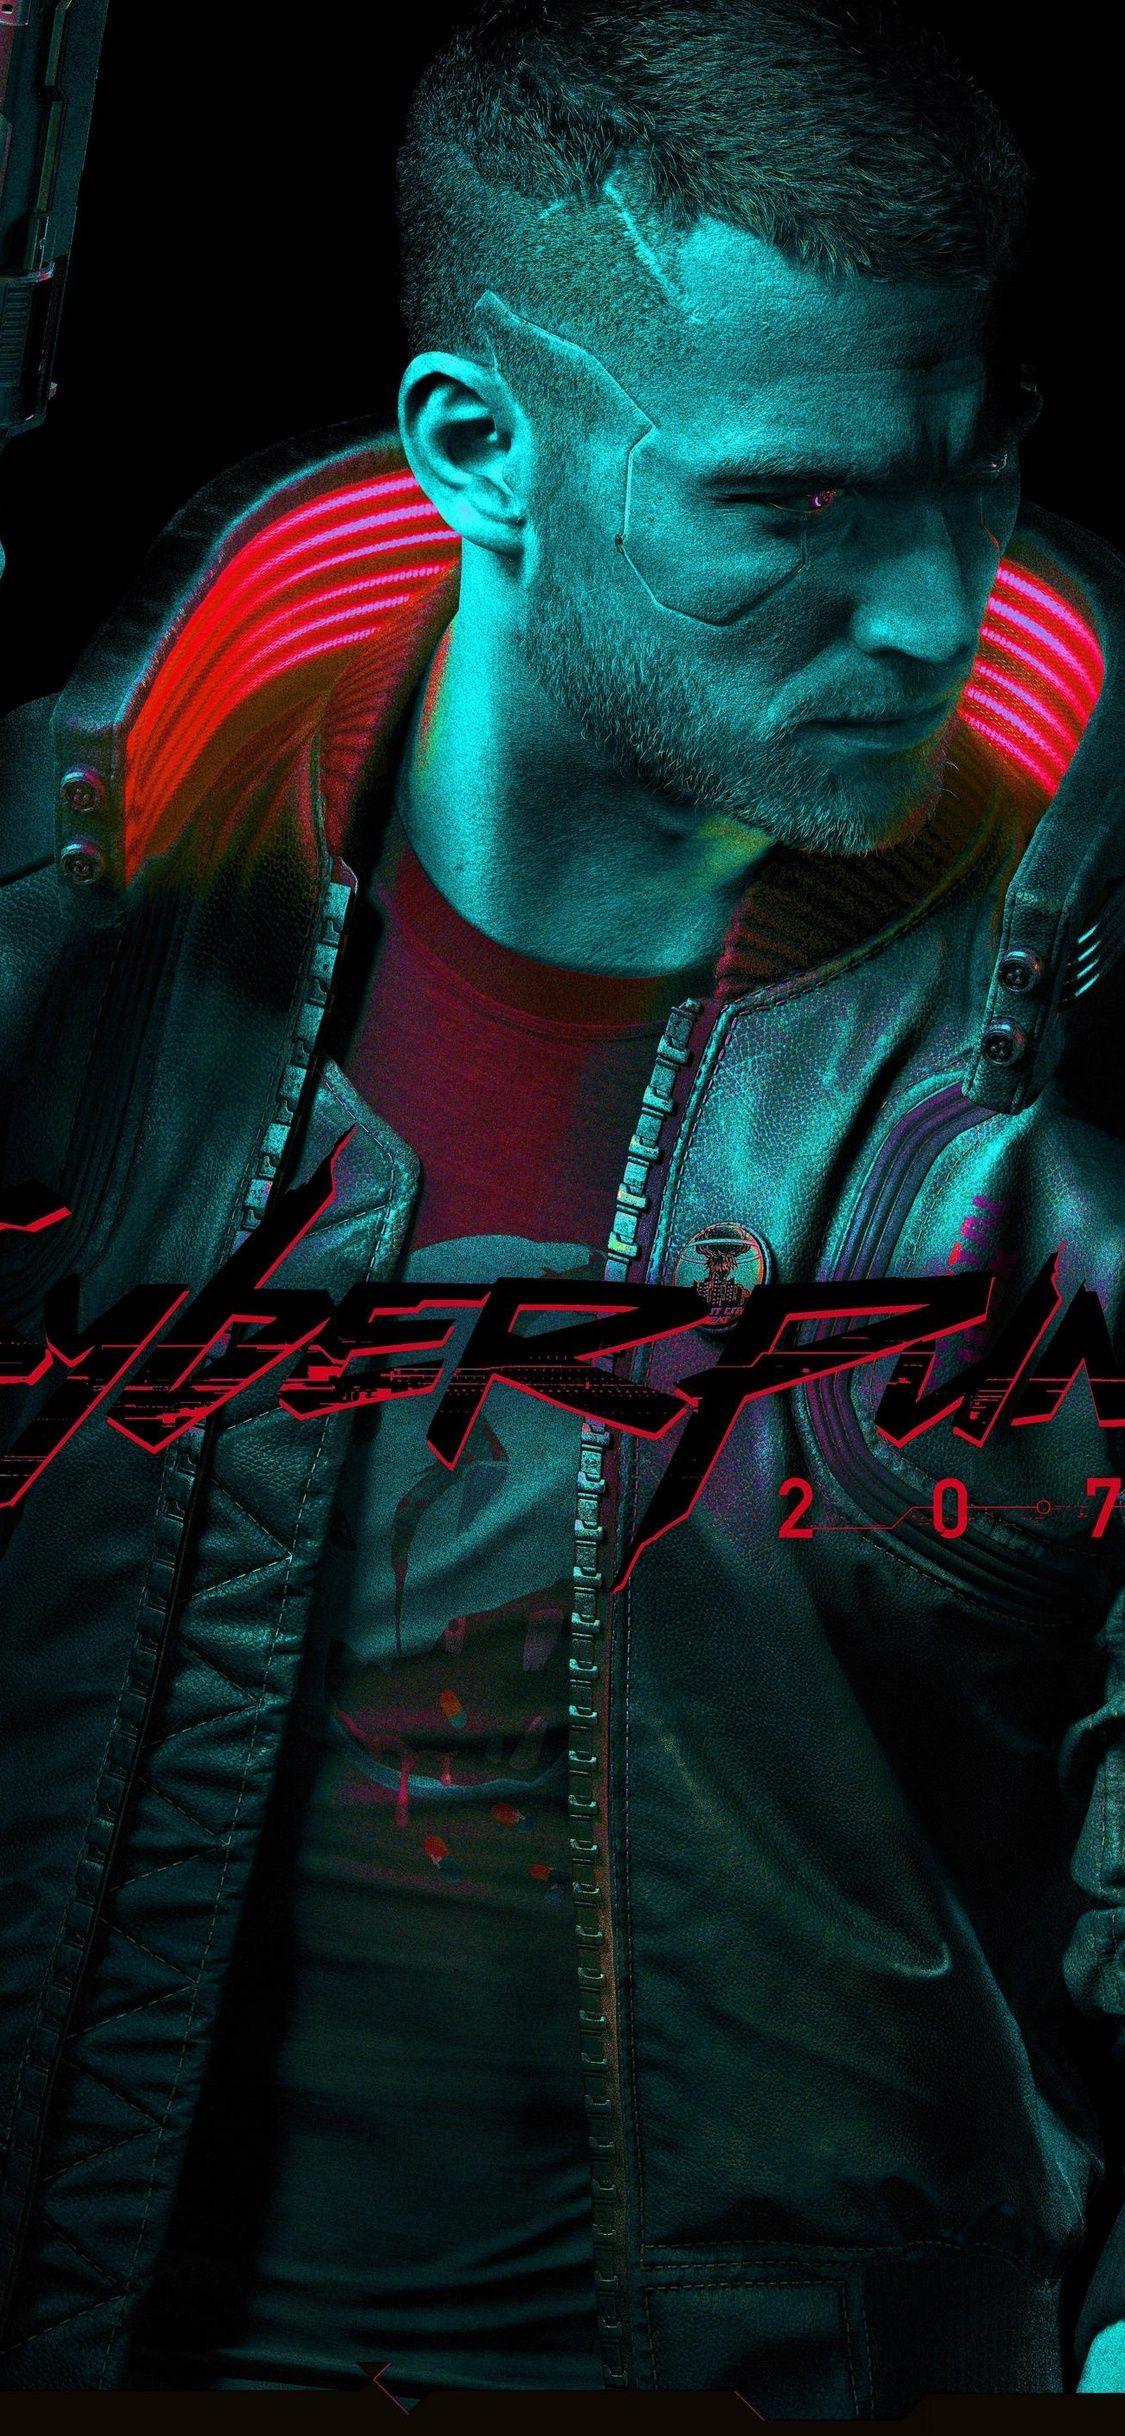 Cyberpunk 2077 iPhone Wallpapers - Wallpaper Cave